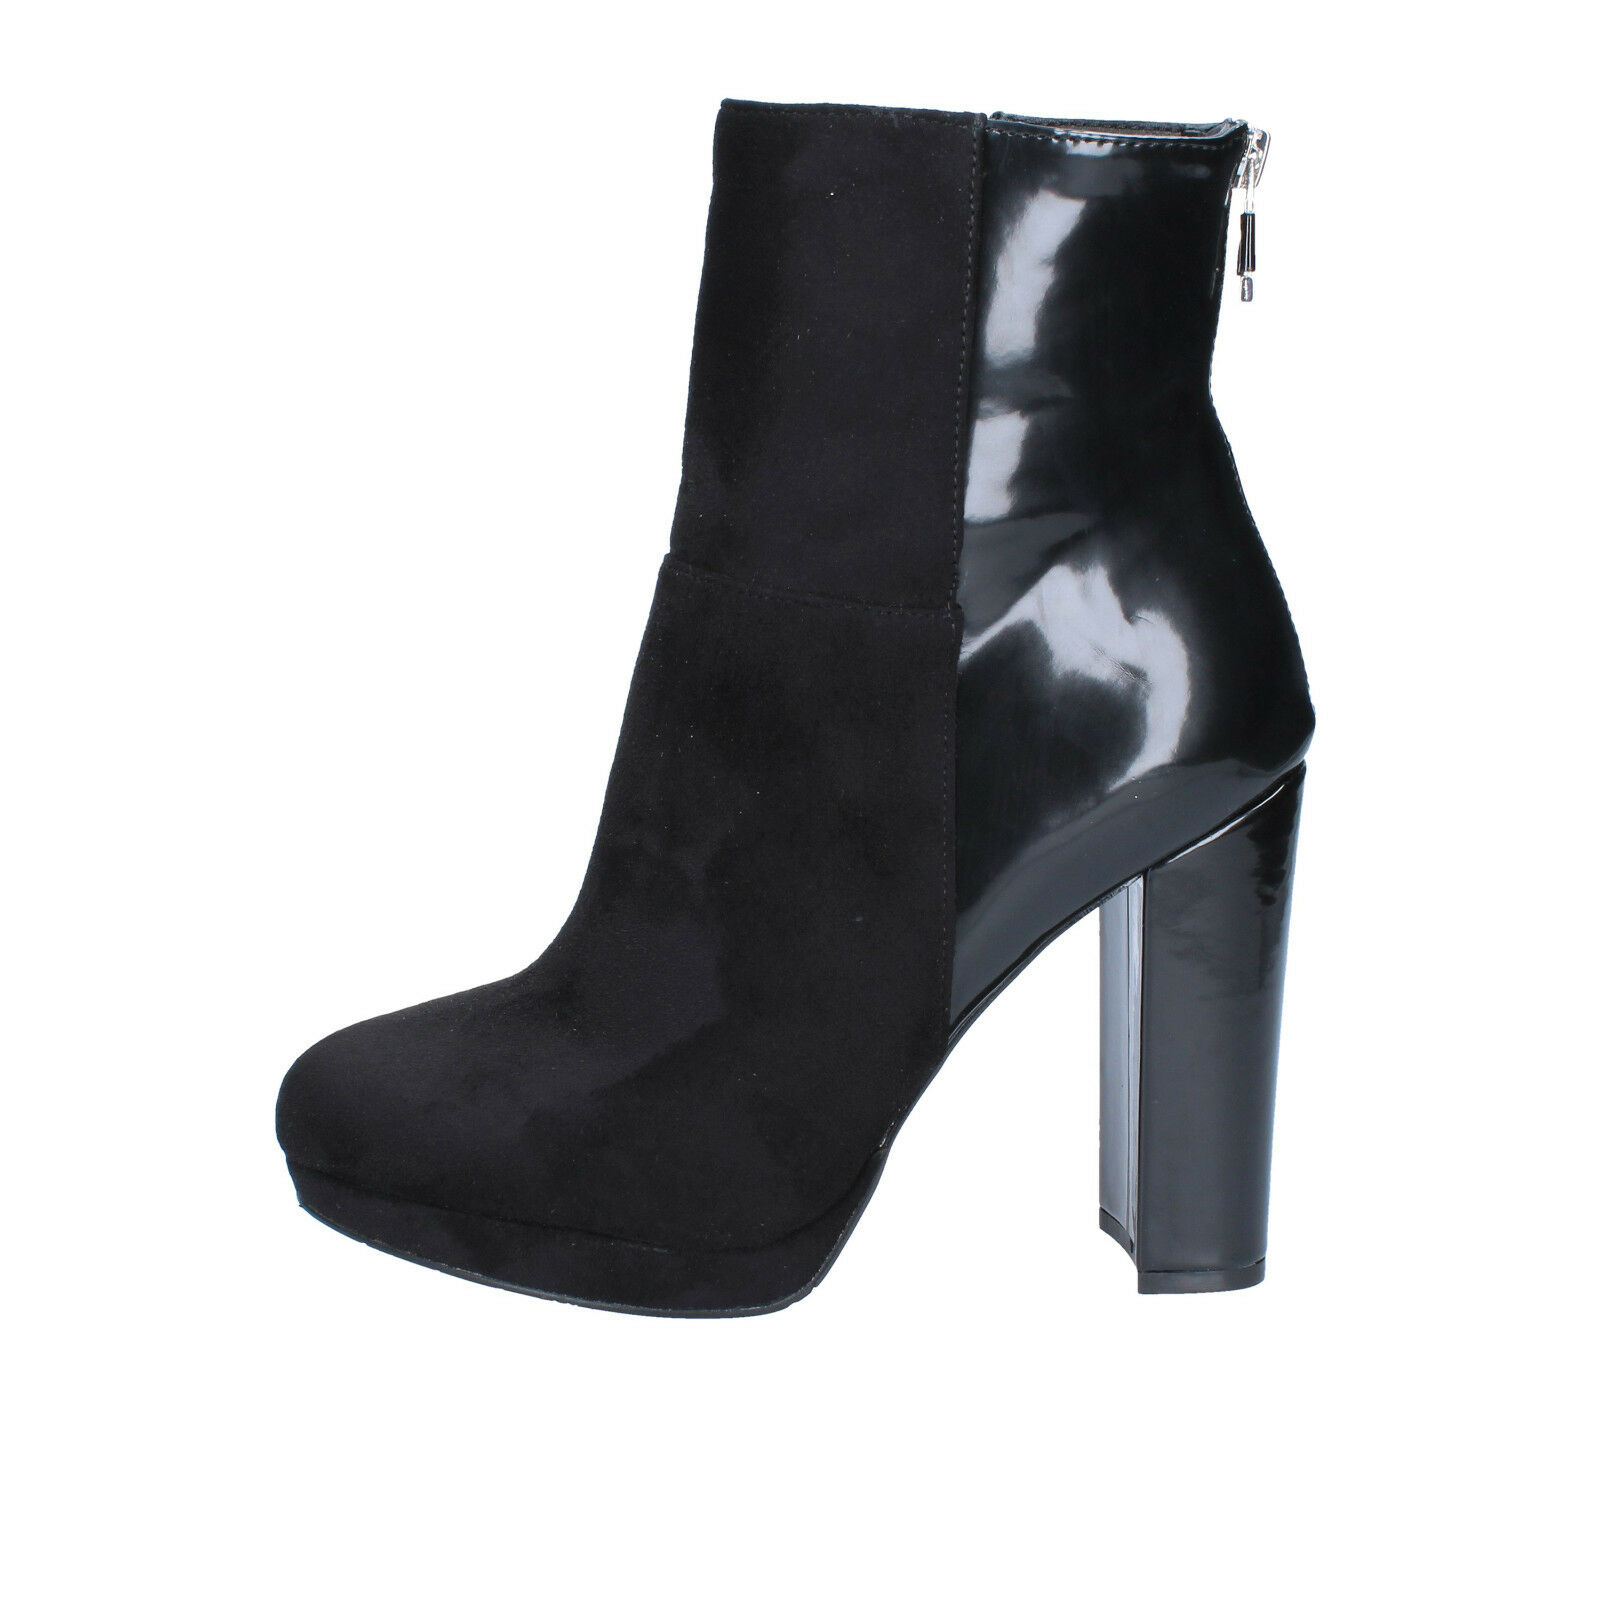 Wouomo scarpe GAUDI' 9 (EU 39) ankle stivali nero suede shiny leather BX64-39